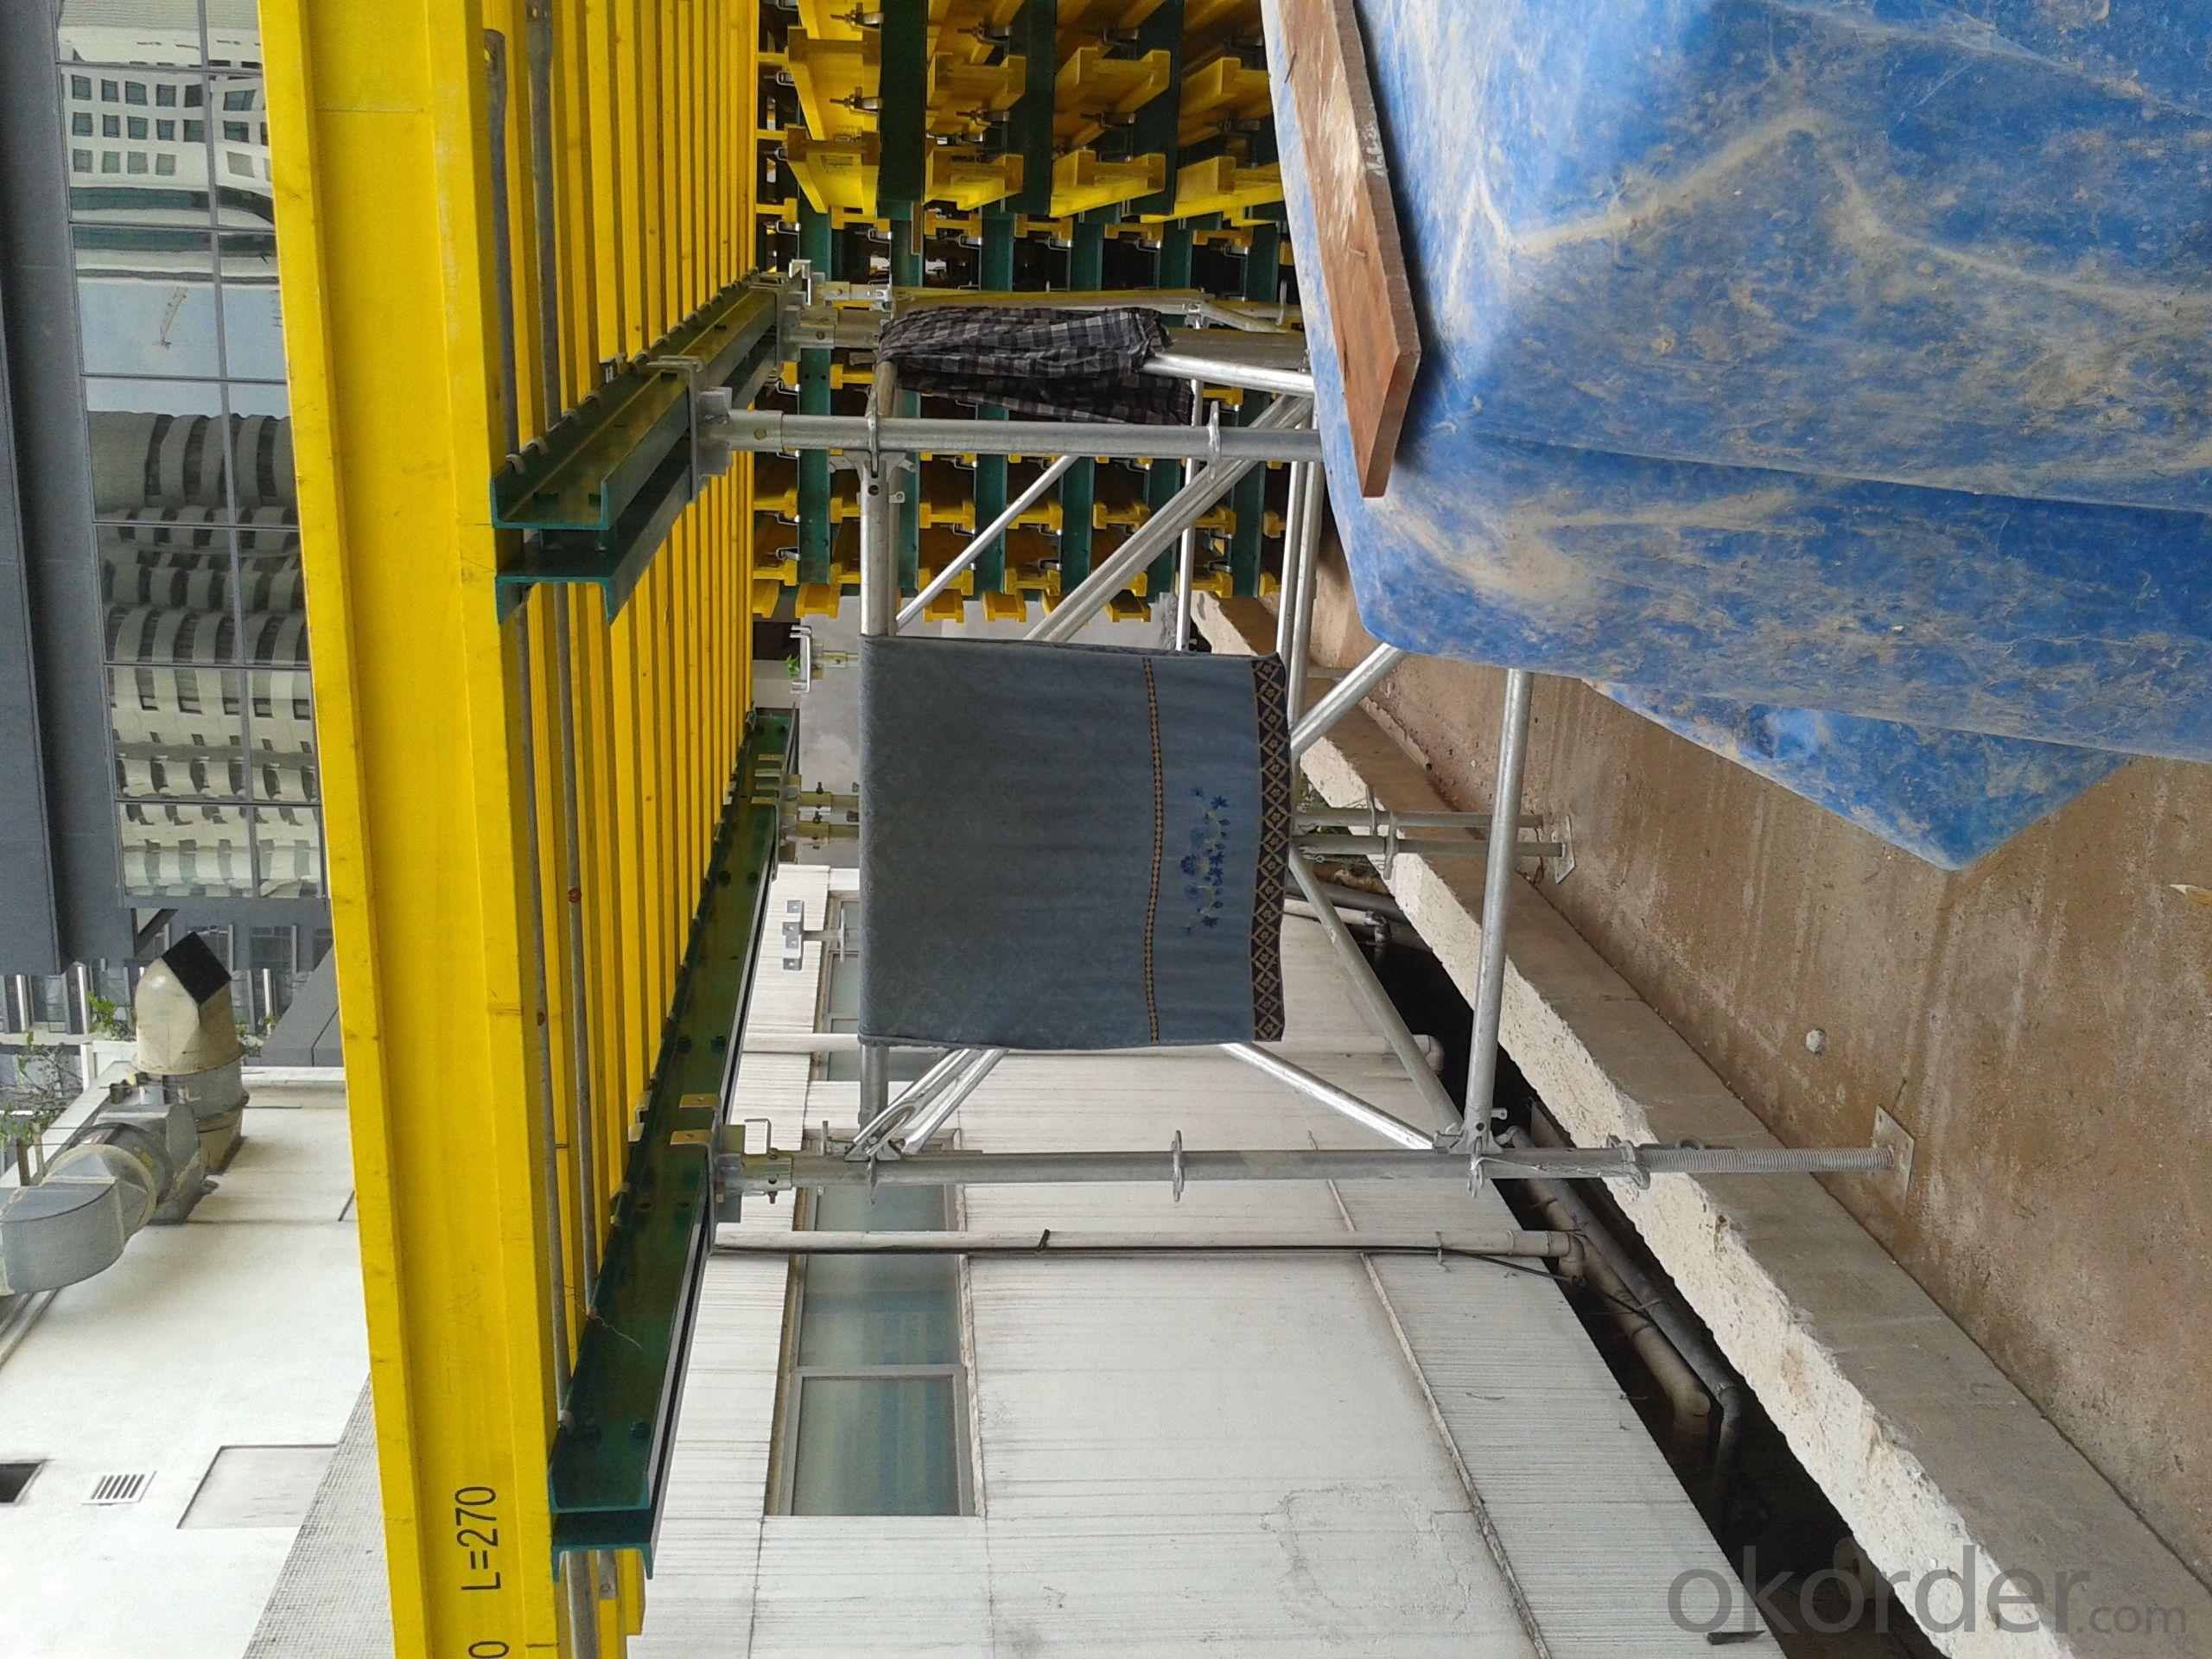 Ring-lock scaffolding